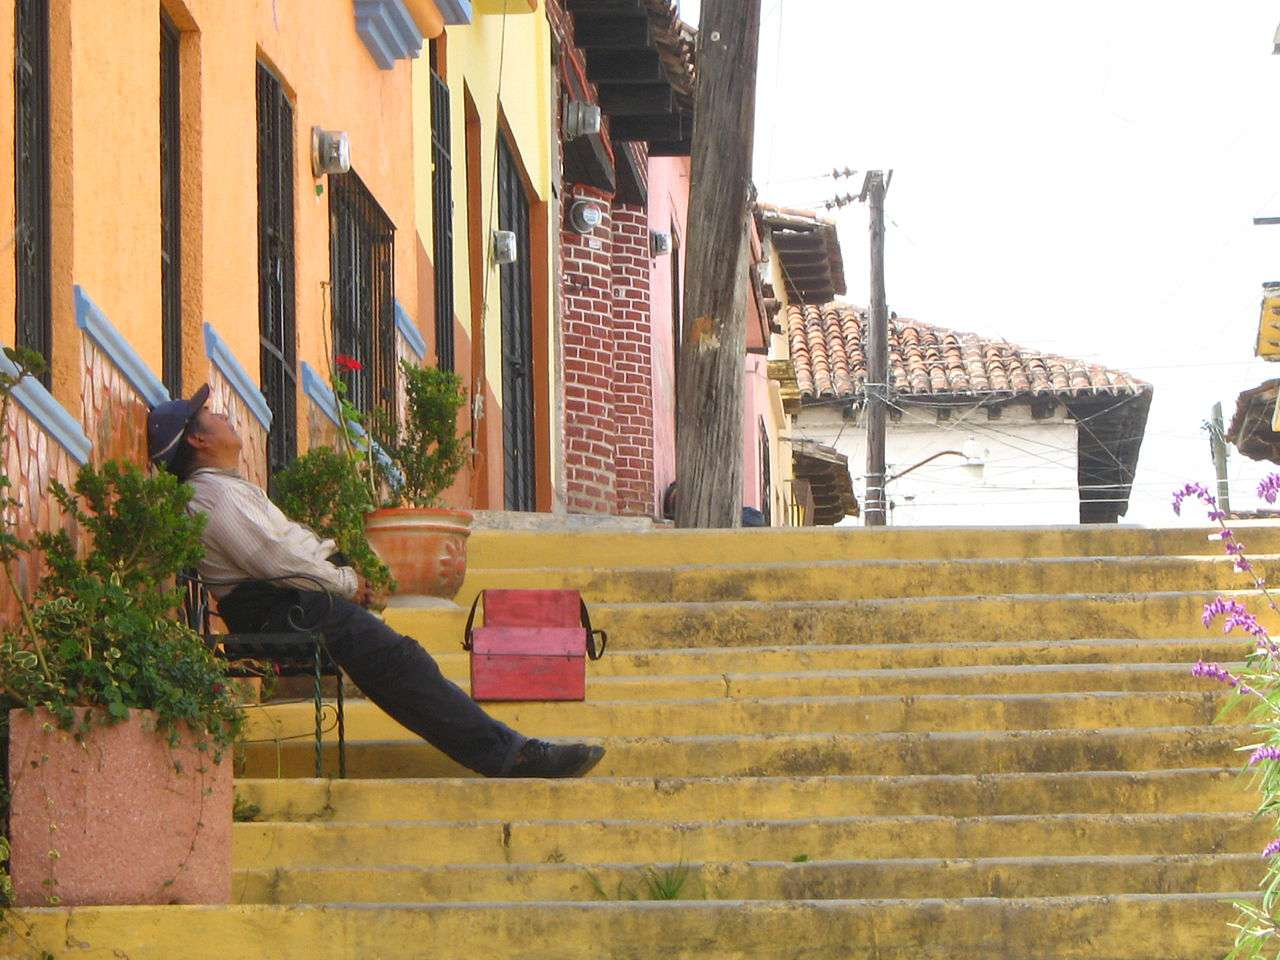 Man sleeping during Siesta